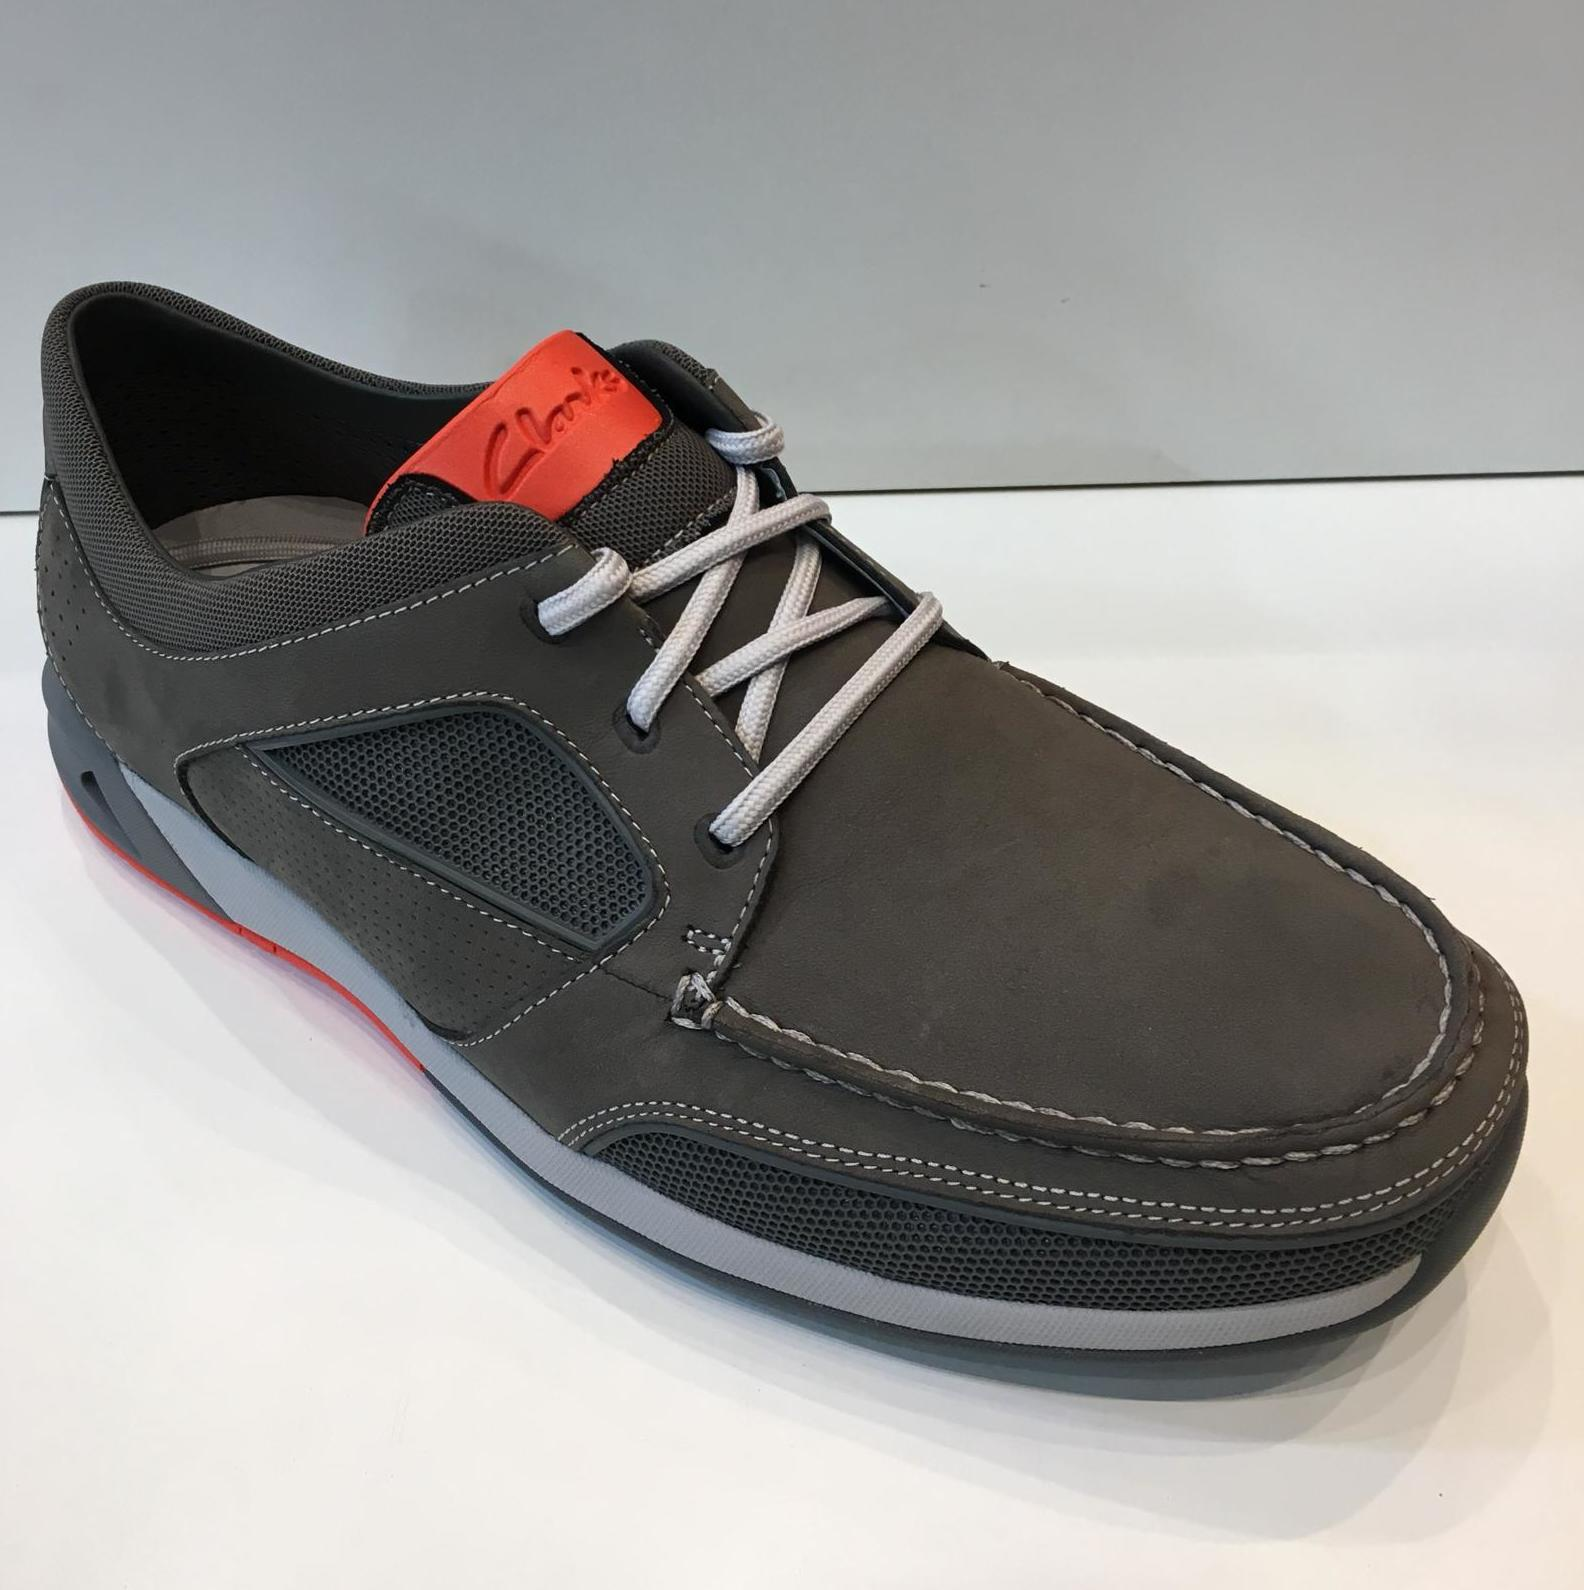 zapato clarks